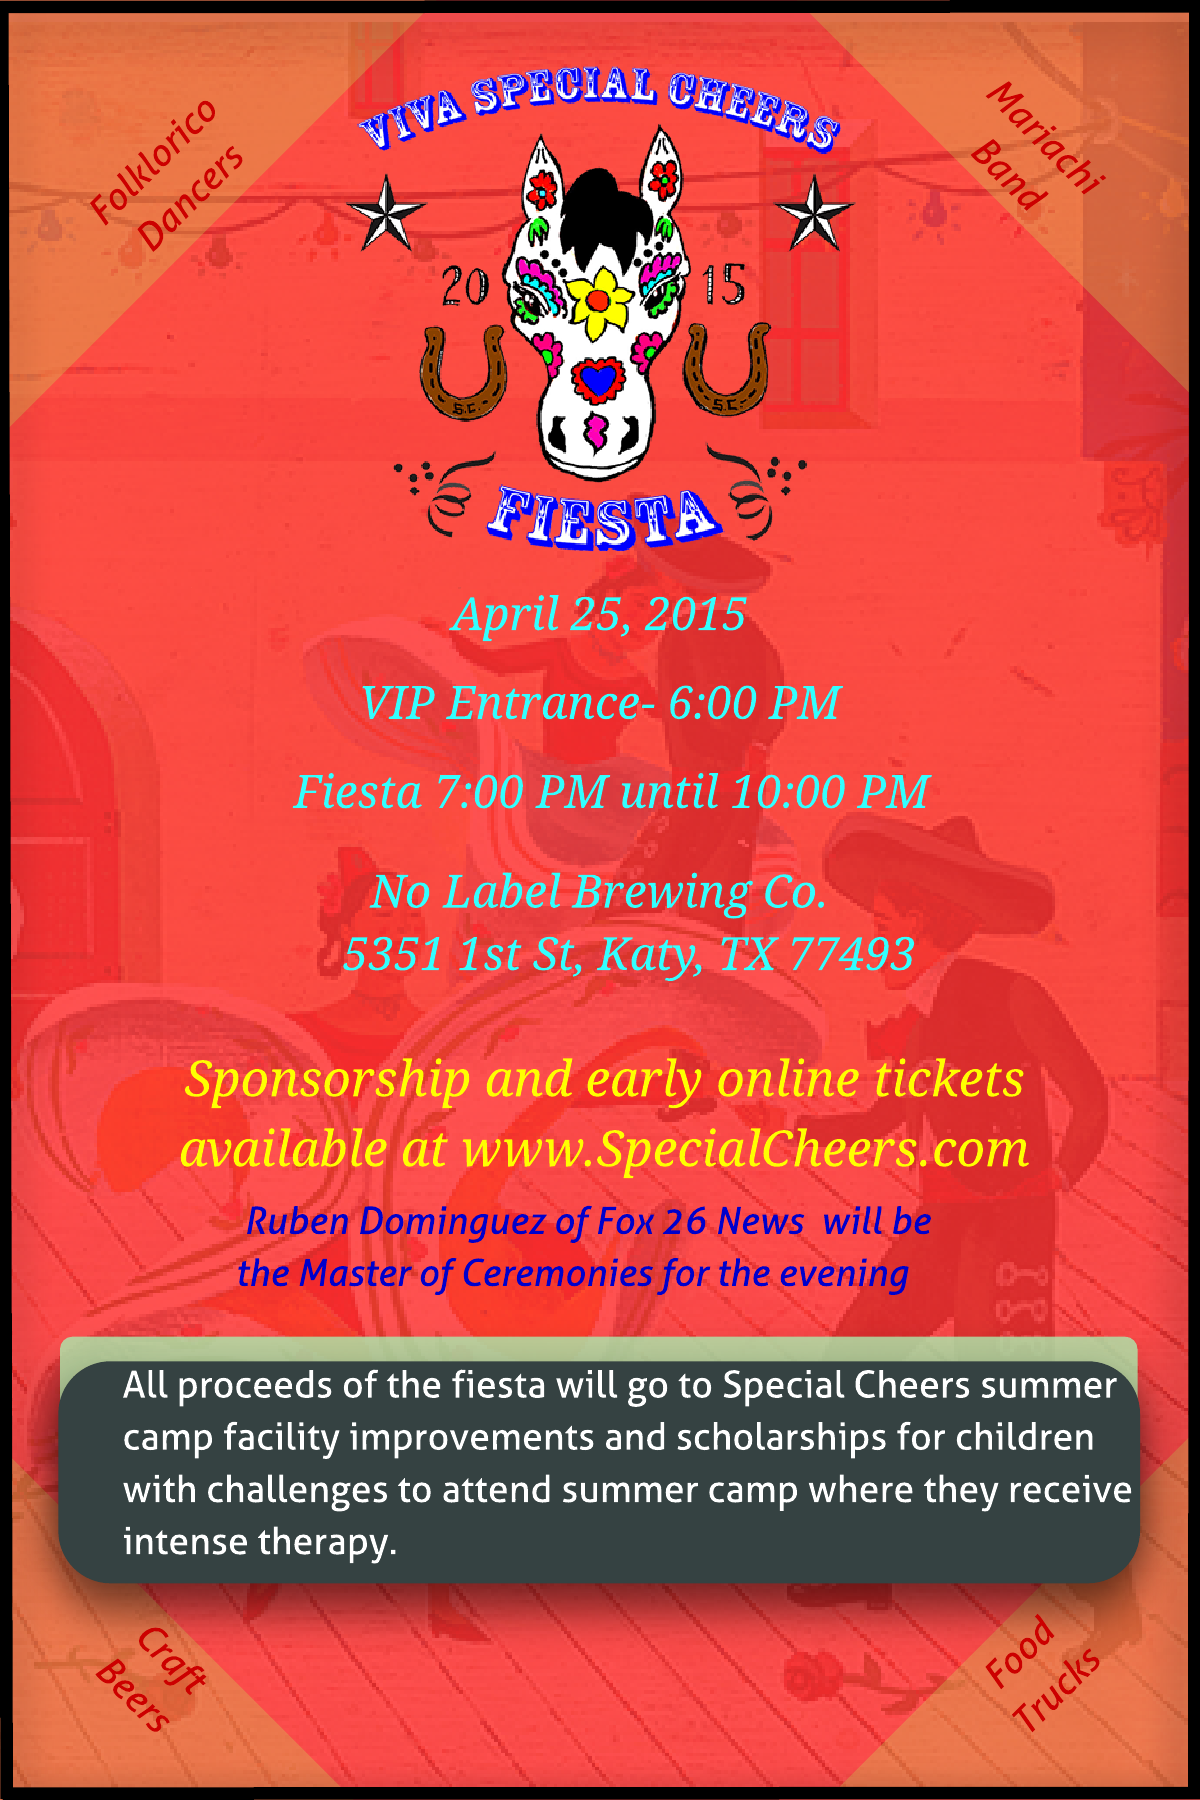 Viva Special Cheers Fiesta Postcard - Invitation.png